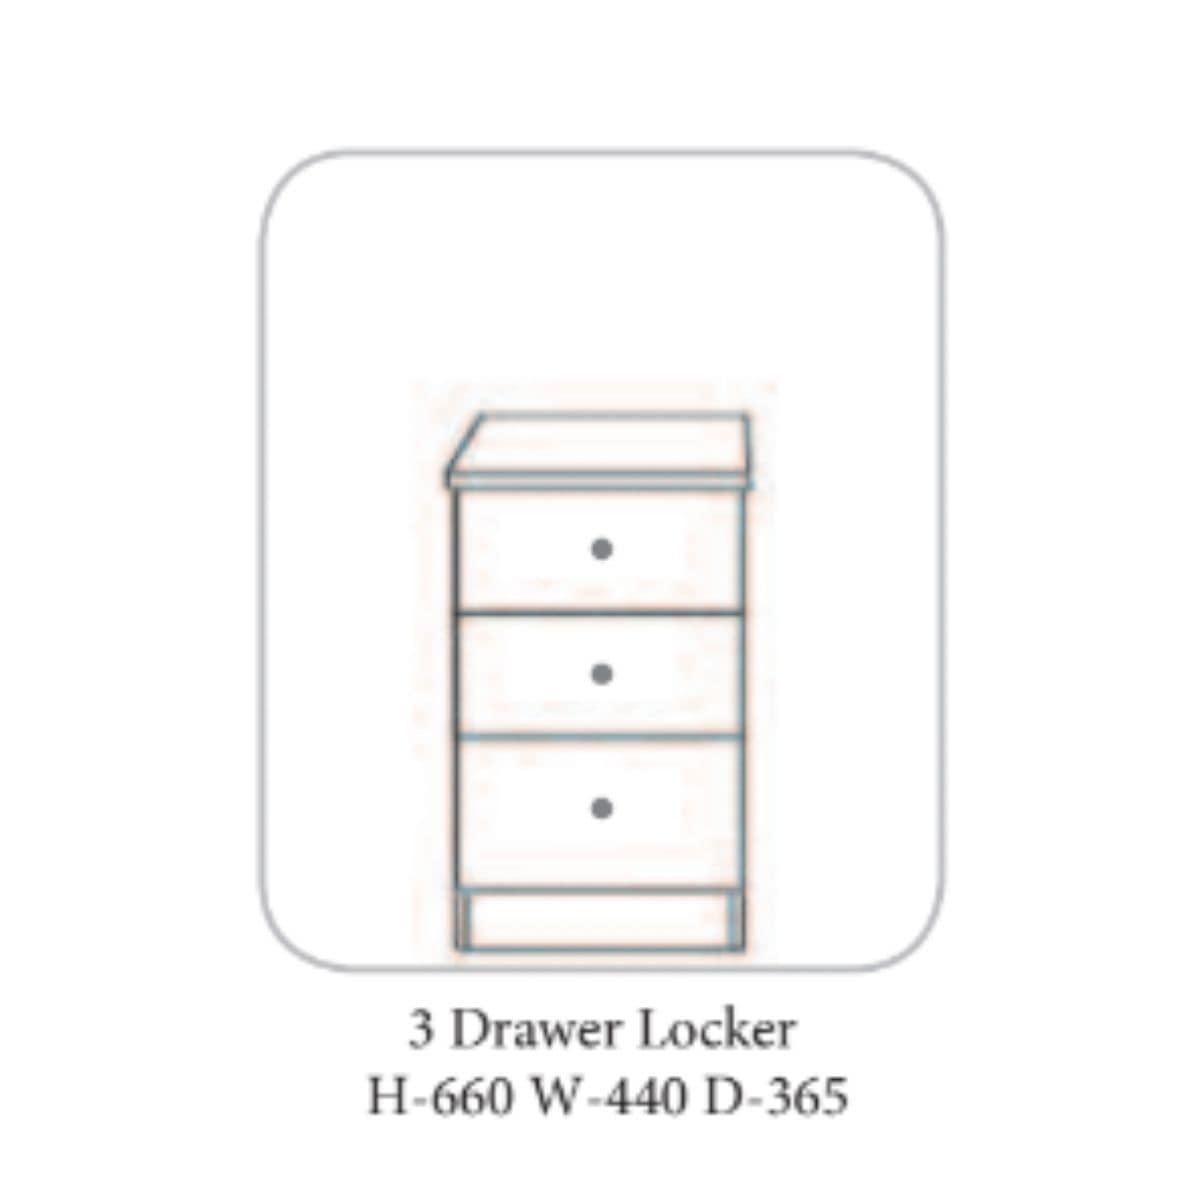 Bandon Locker Walnut - 4 Options